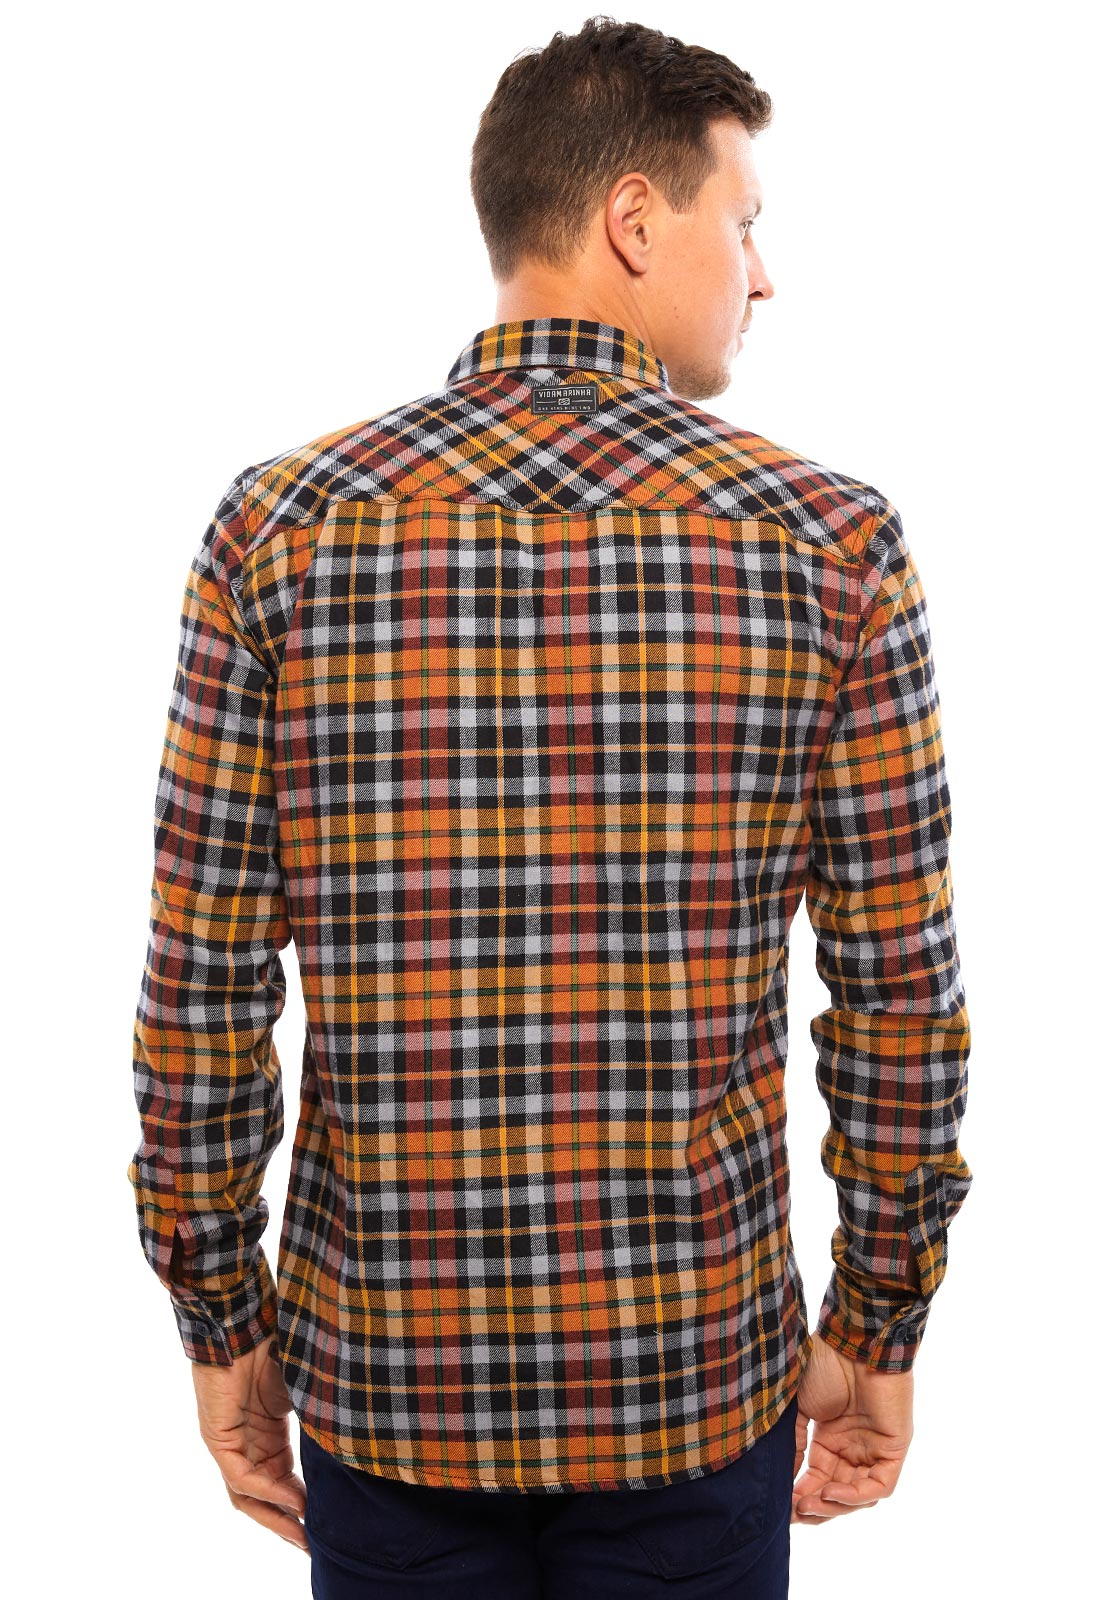 Camisa de Flanela Vida Marinha Manga Longa Xadrez